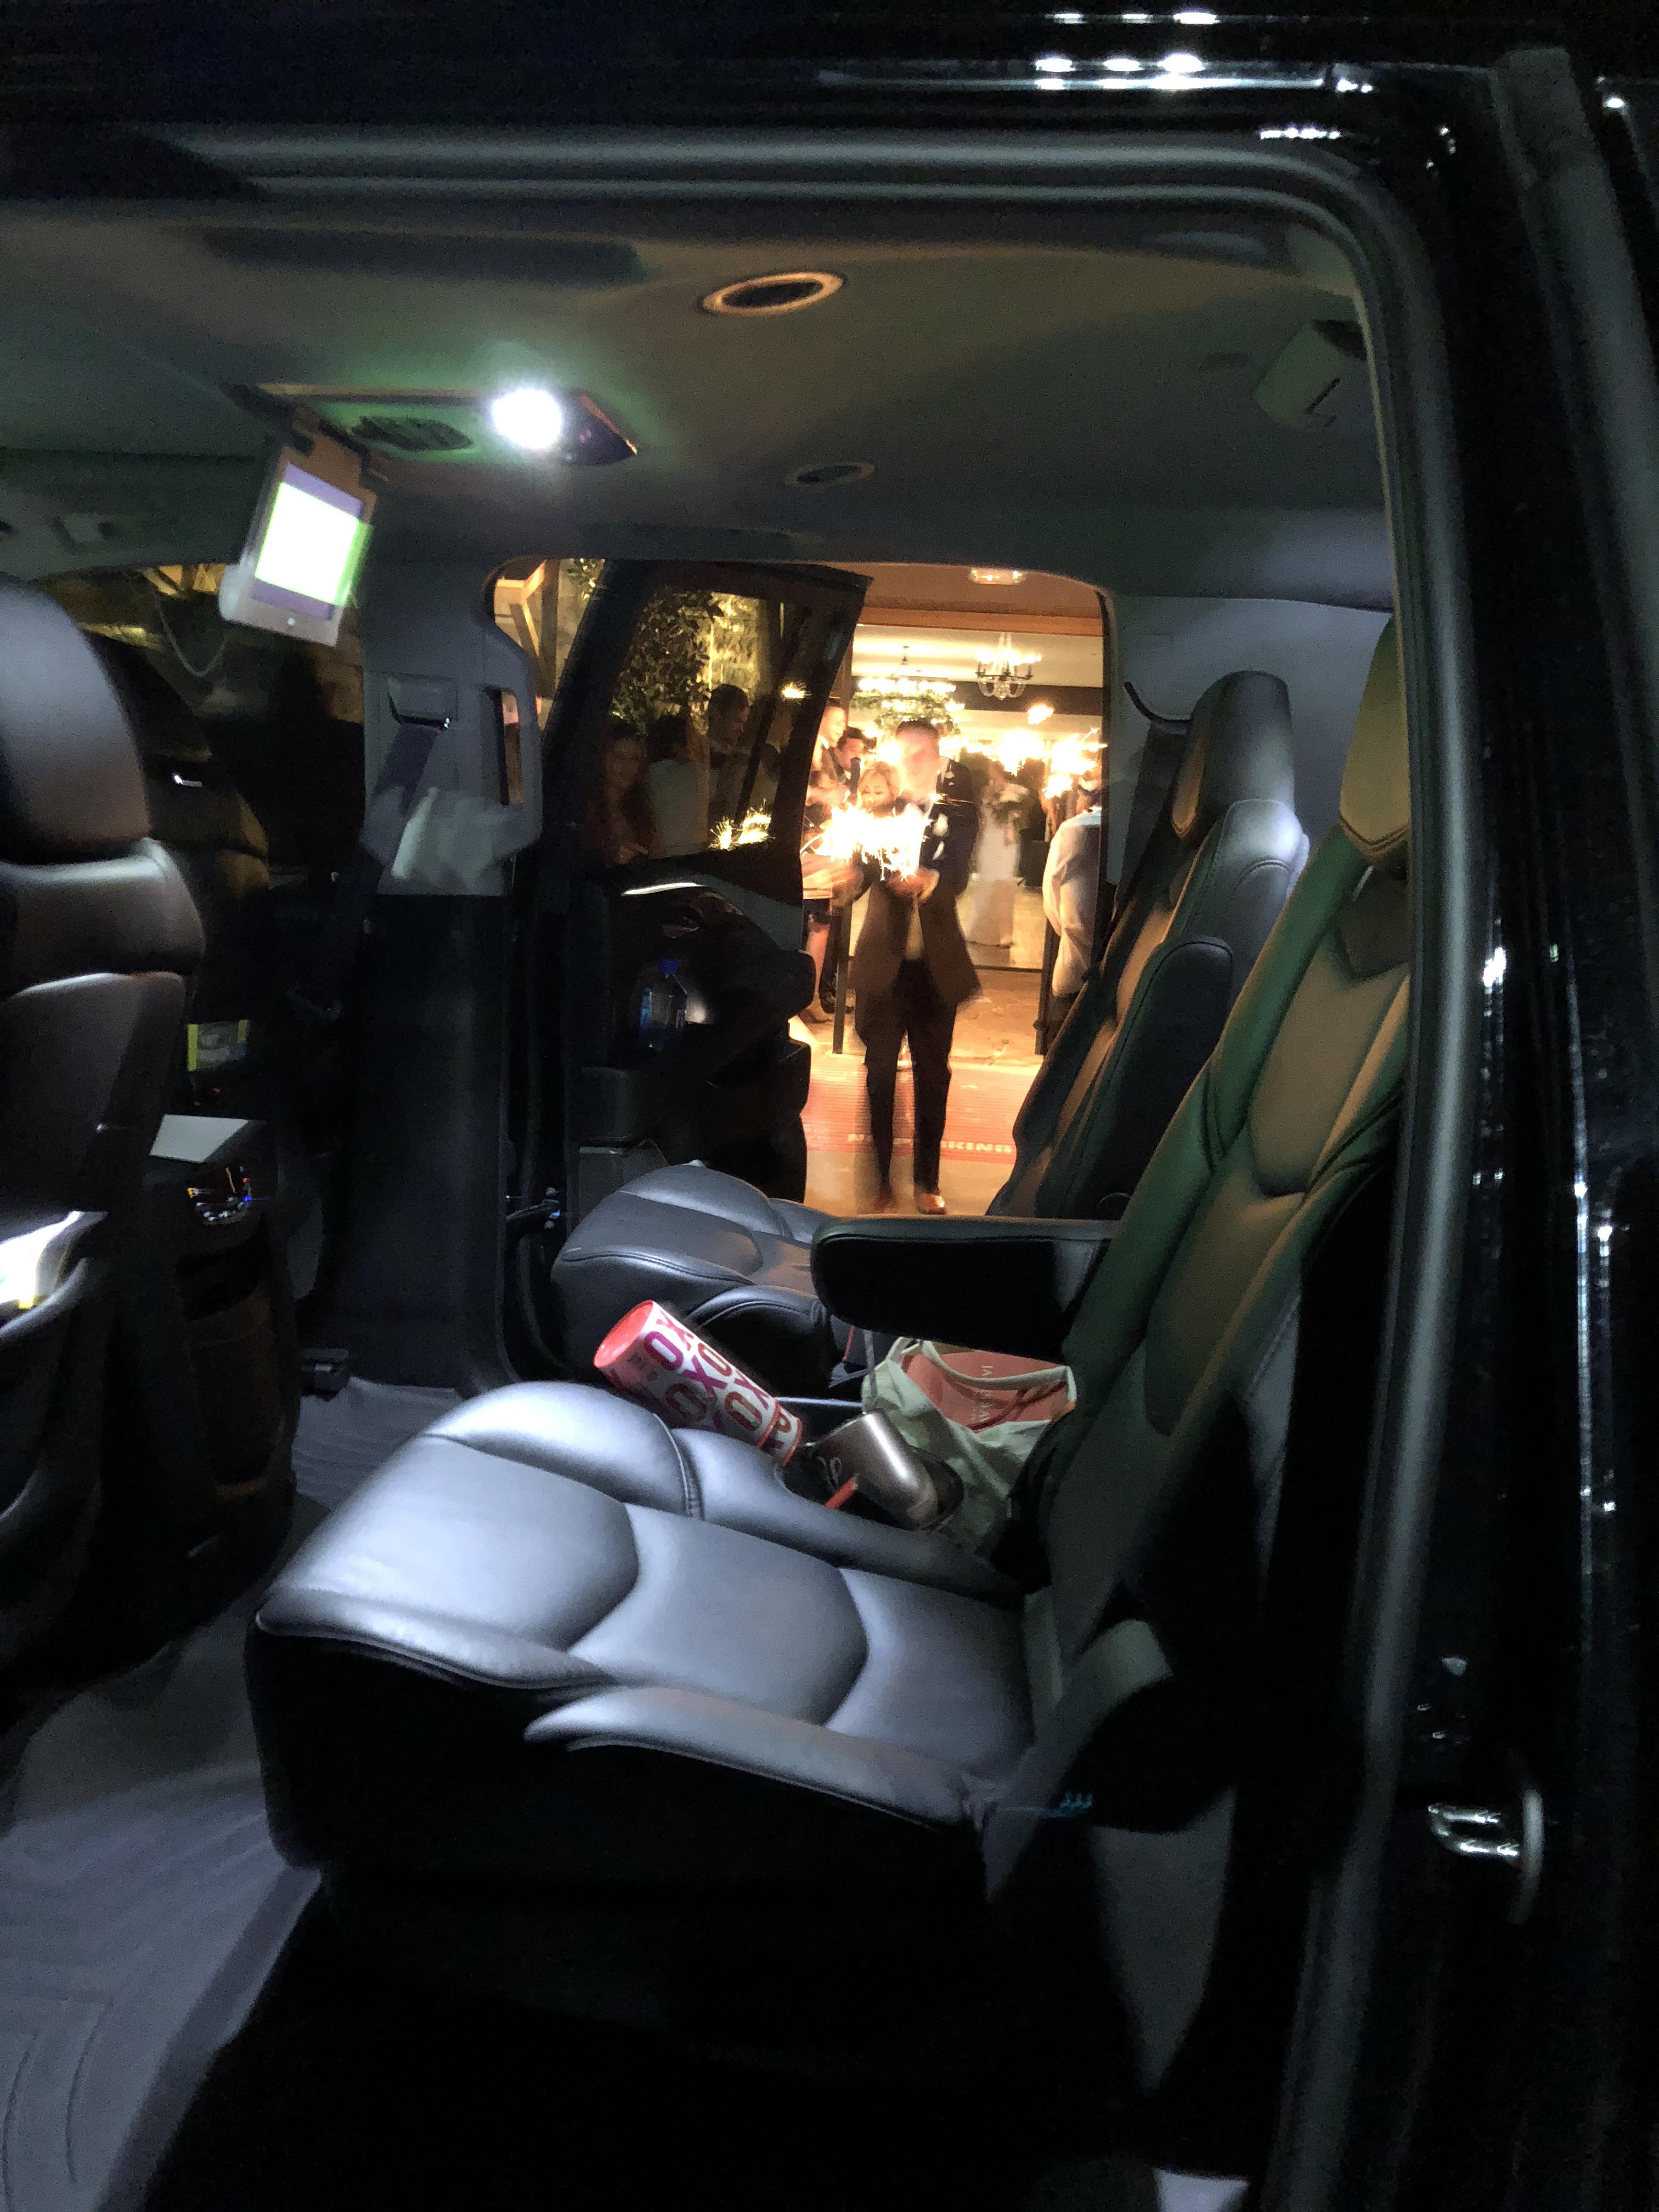 Katy limousine